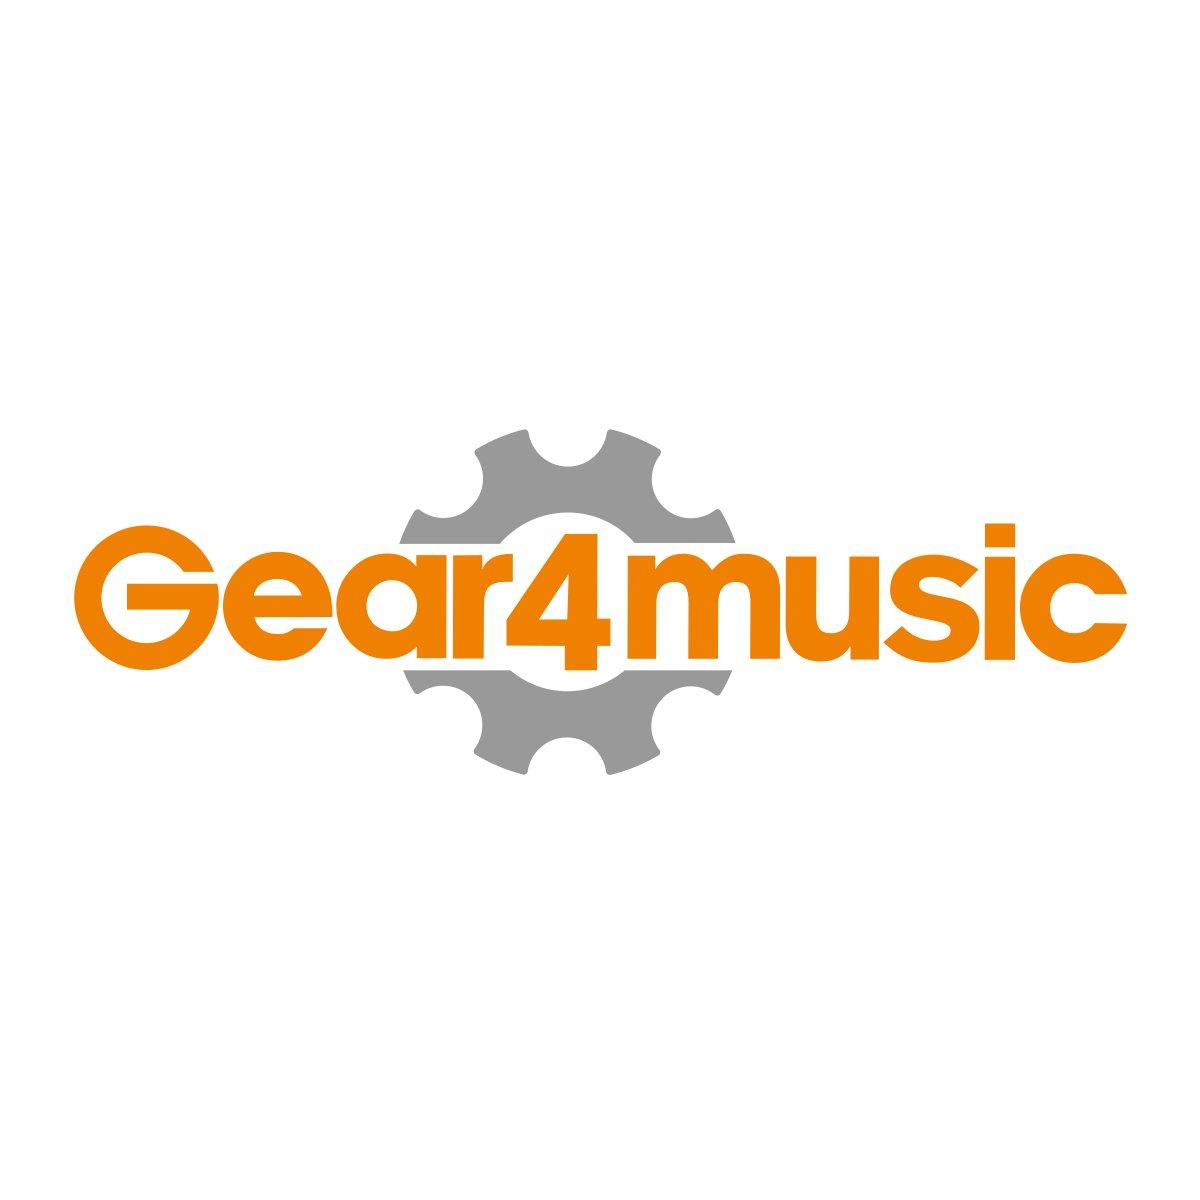 4 String Banjo by Gear4music